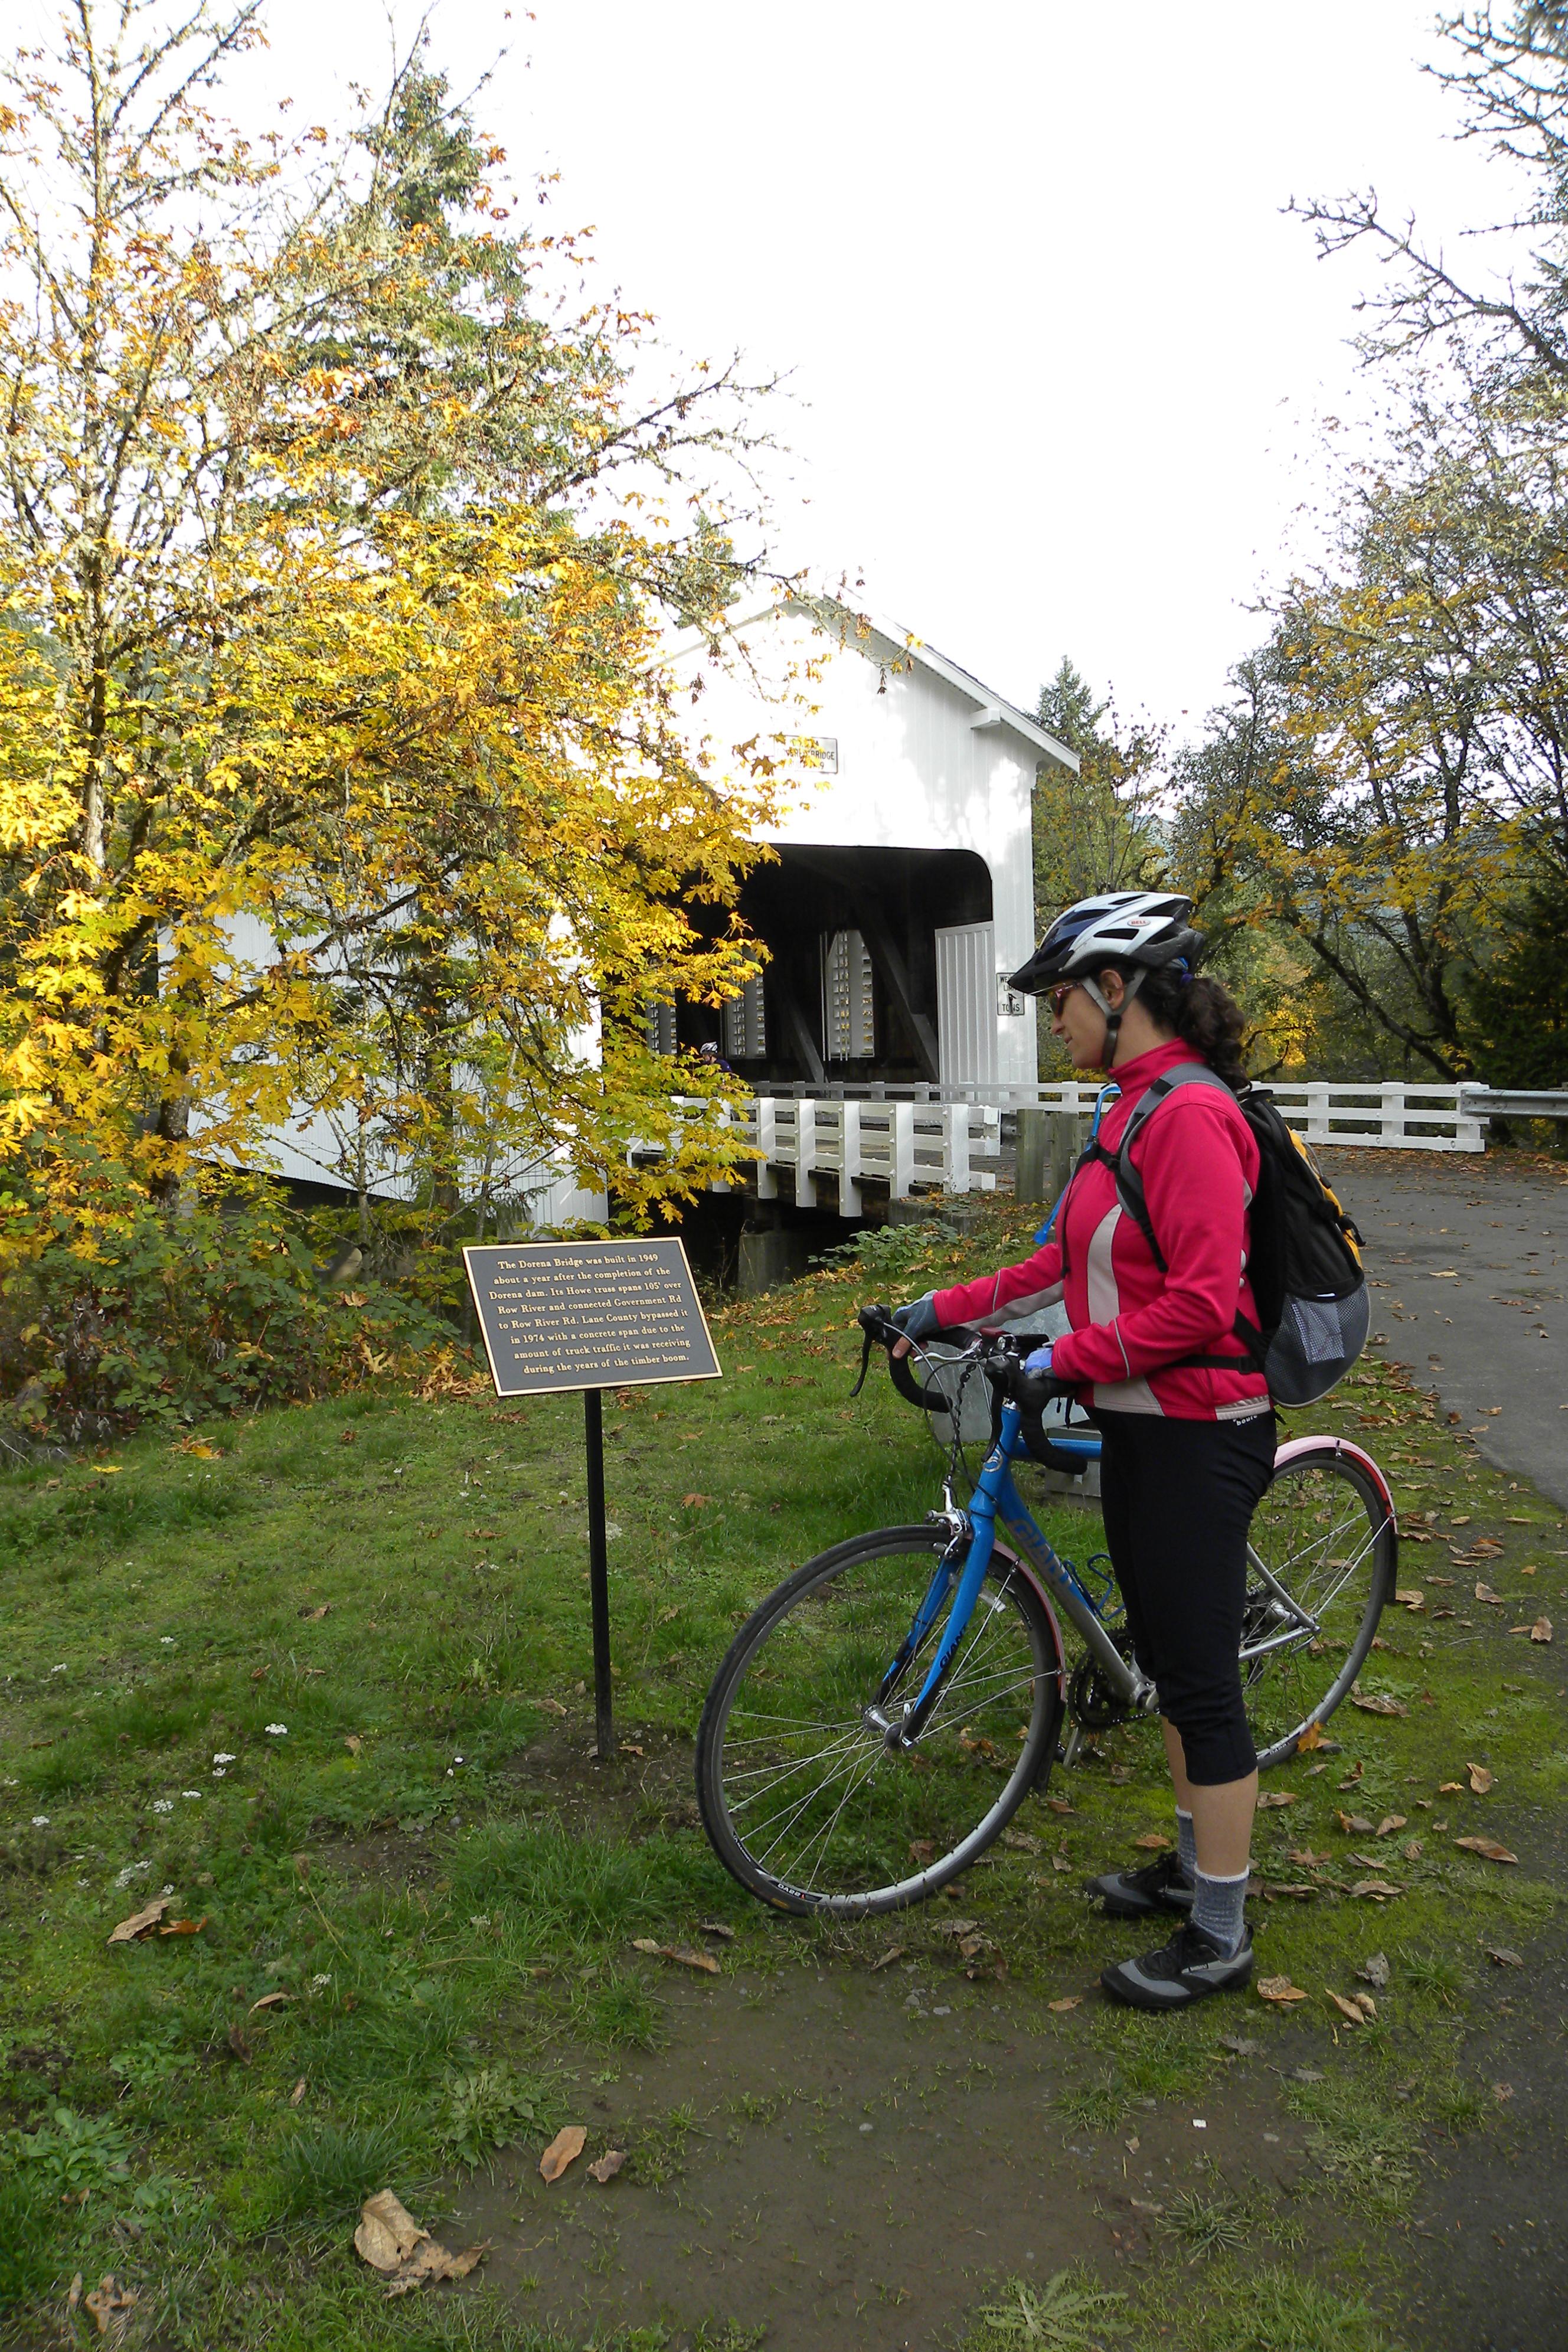 Fine Covered Bridges Scenic Bikeway Eugene Cascades Oregon Coast Interior Design Ideas Gentotryabchikinfo